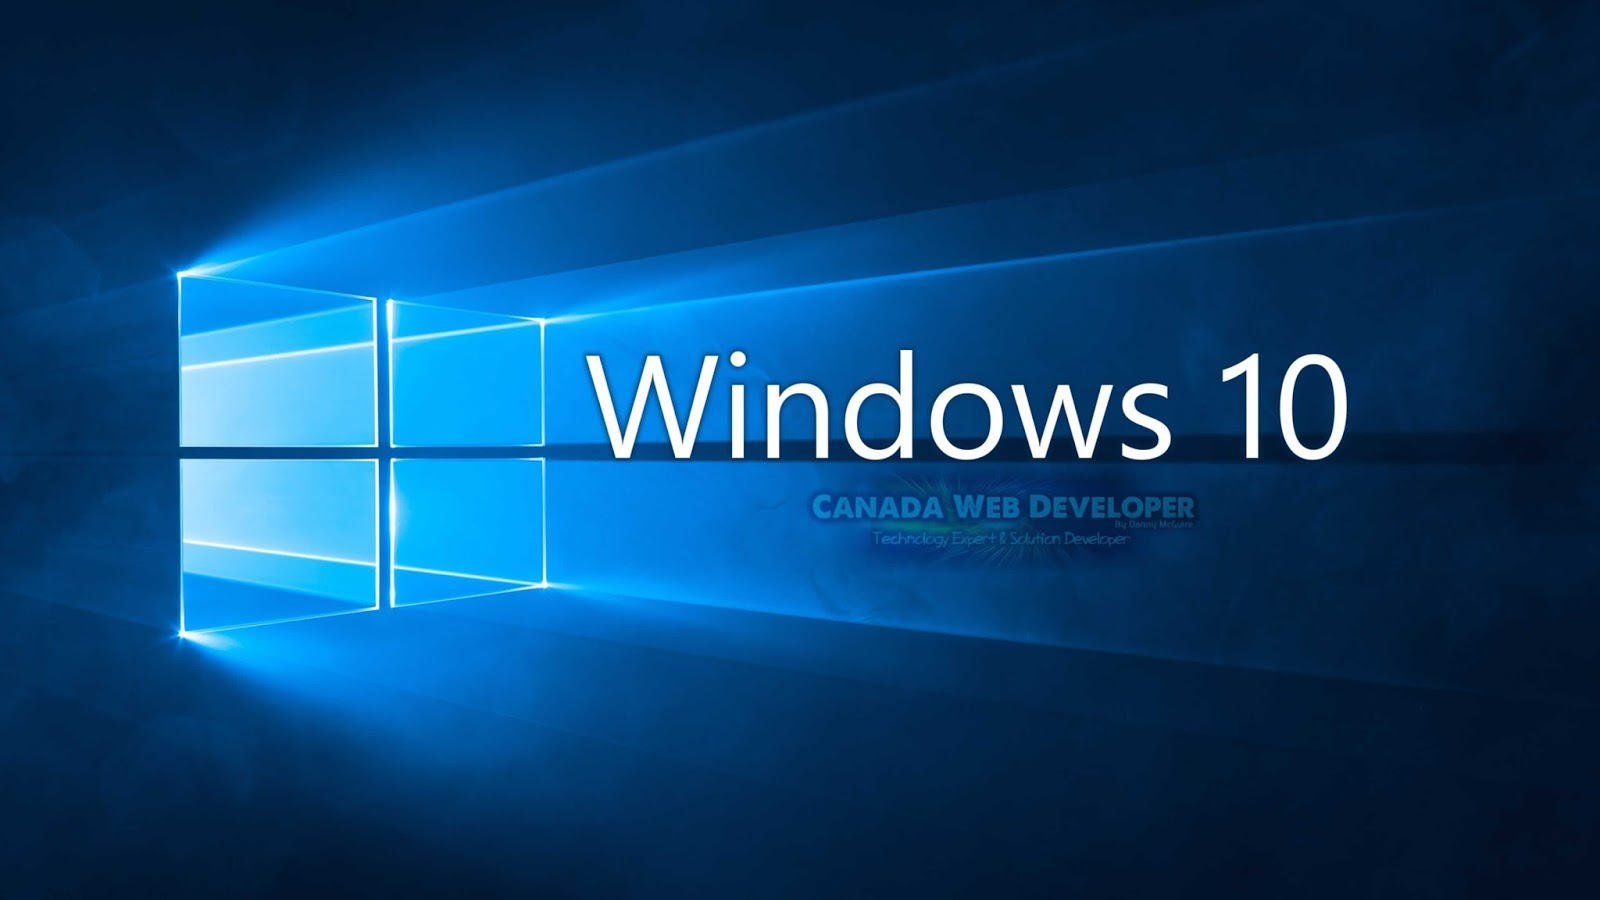 download windows 10 free crack